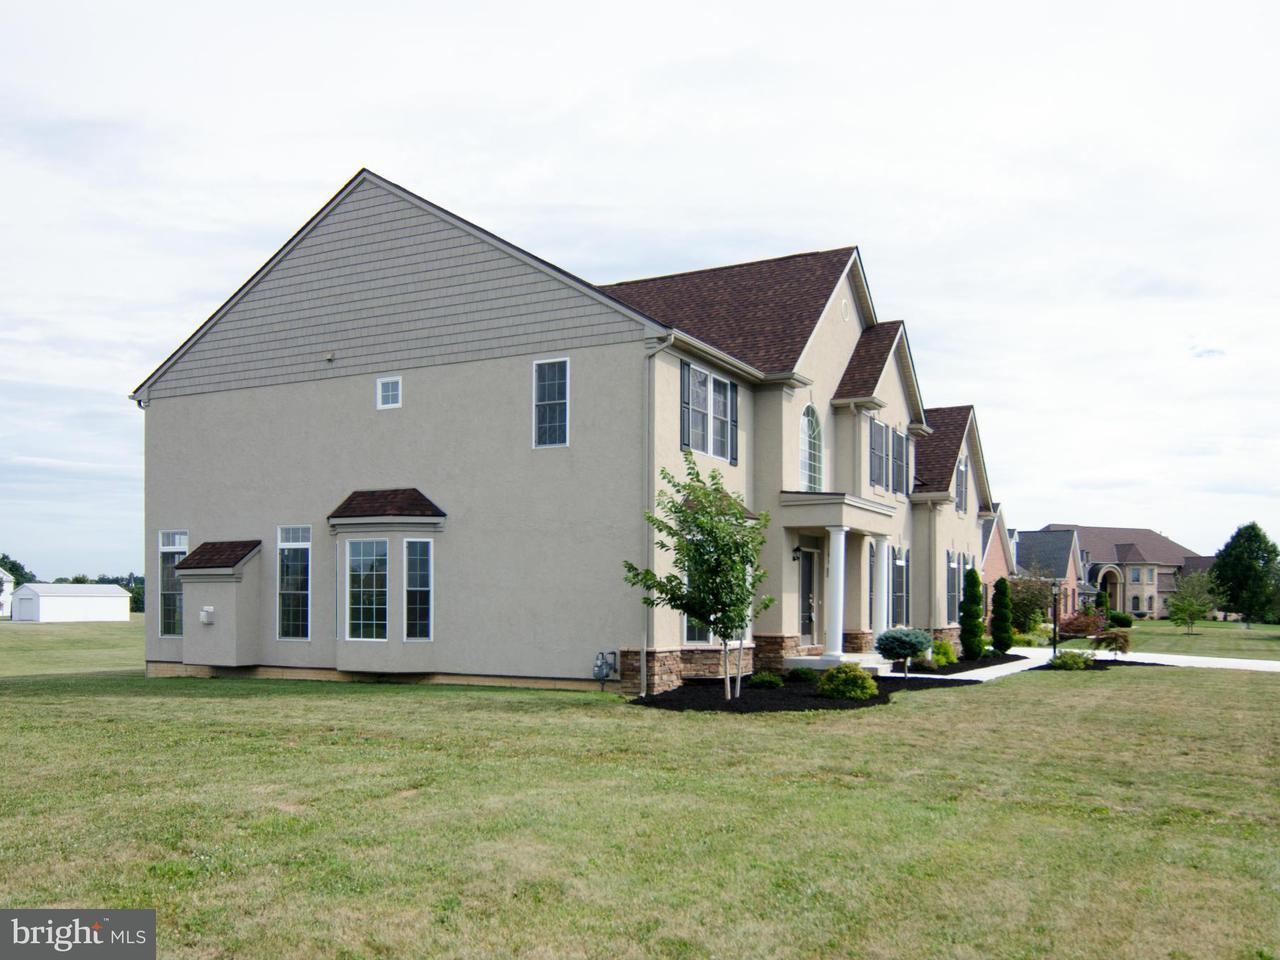 Additional photo for property listing at 25 Celestial Ter 25 Celestial Ter Greencastle, Πενσιλβανια 17225 Ηνωμενεσ Πολιτειεσ